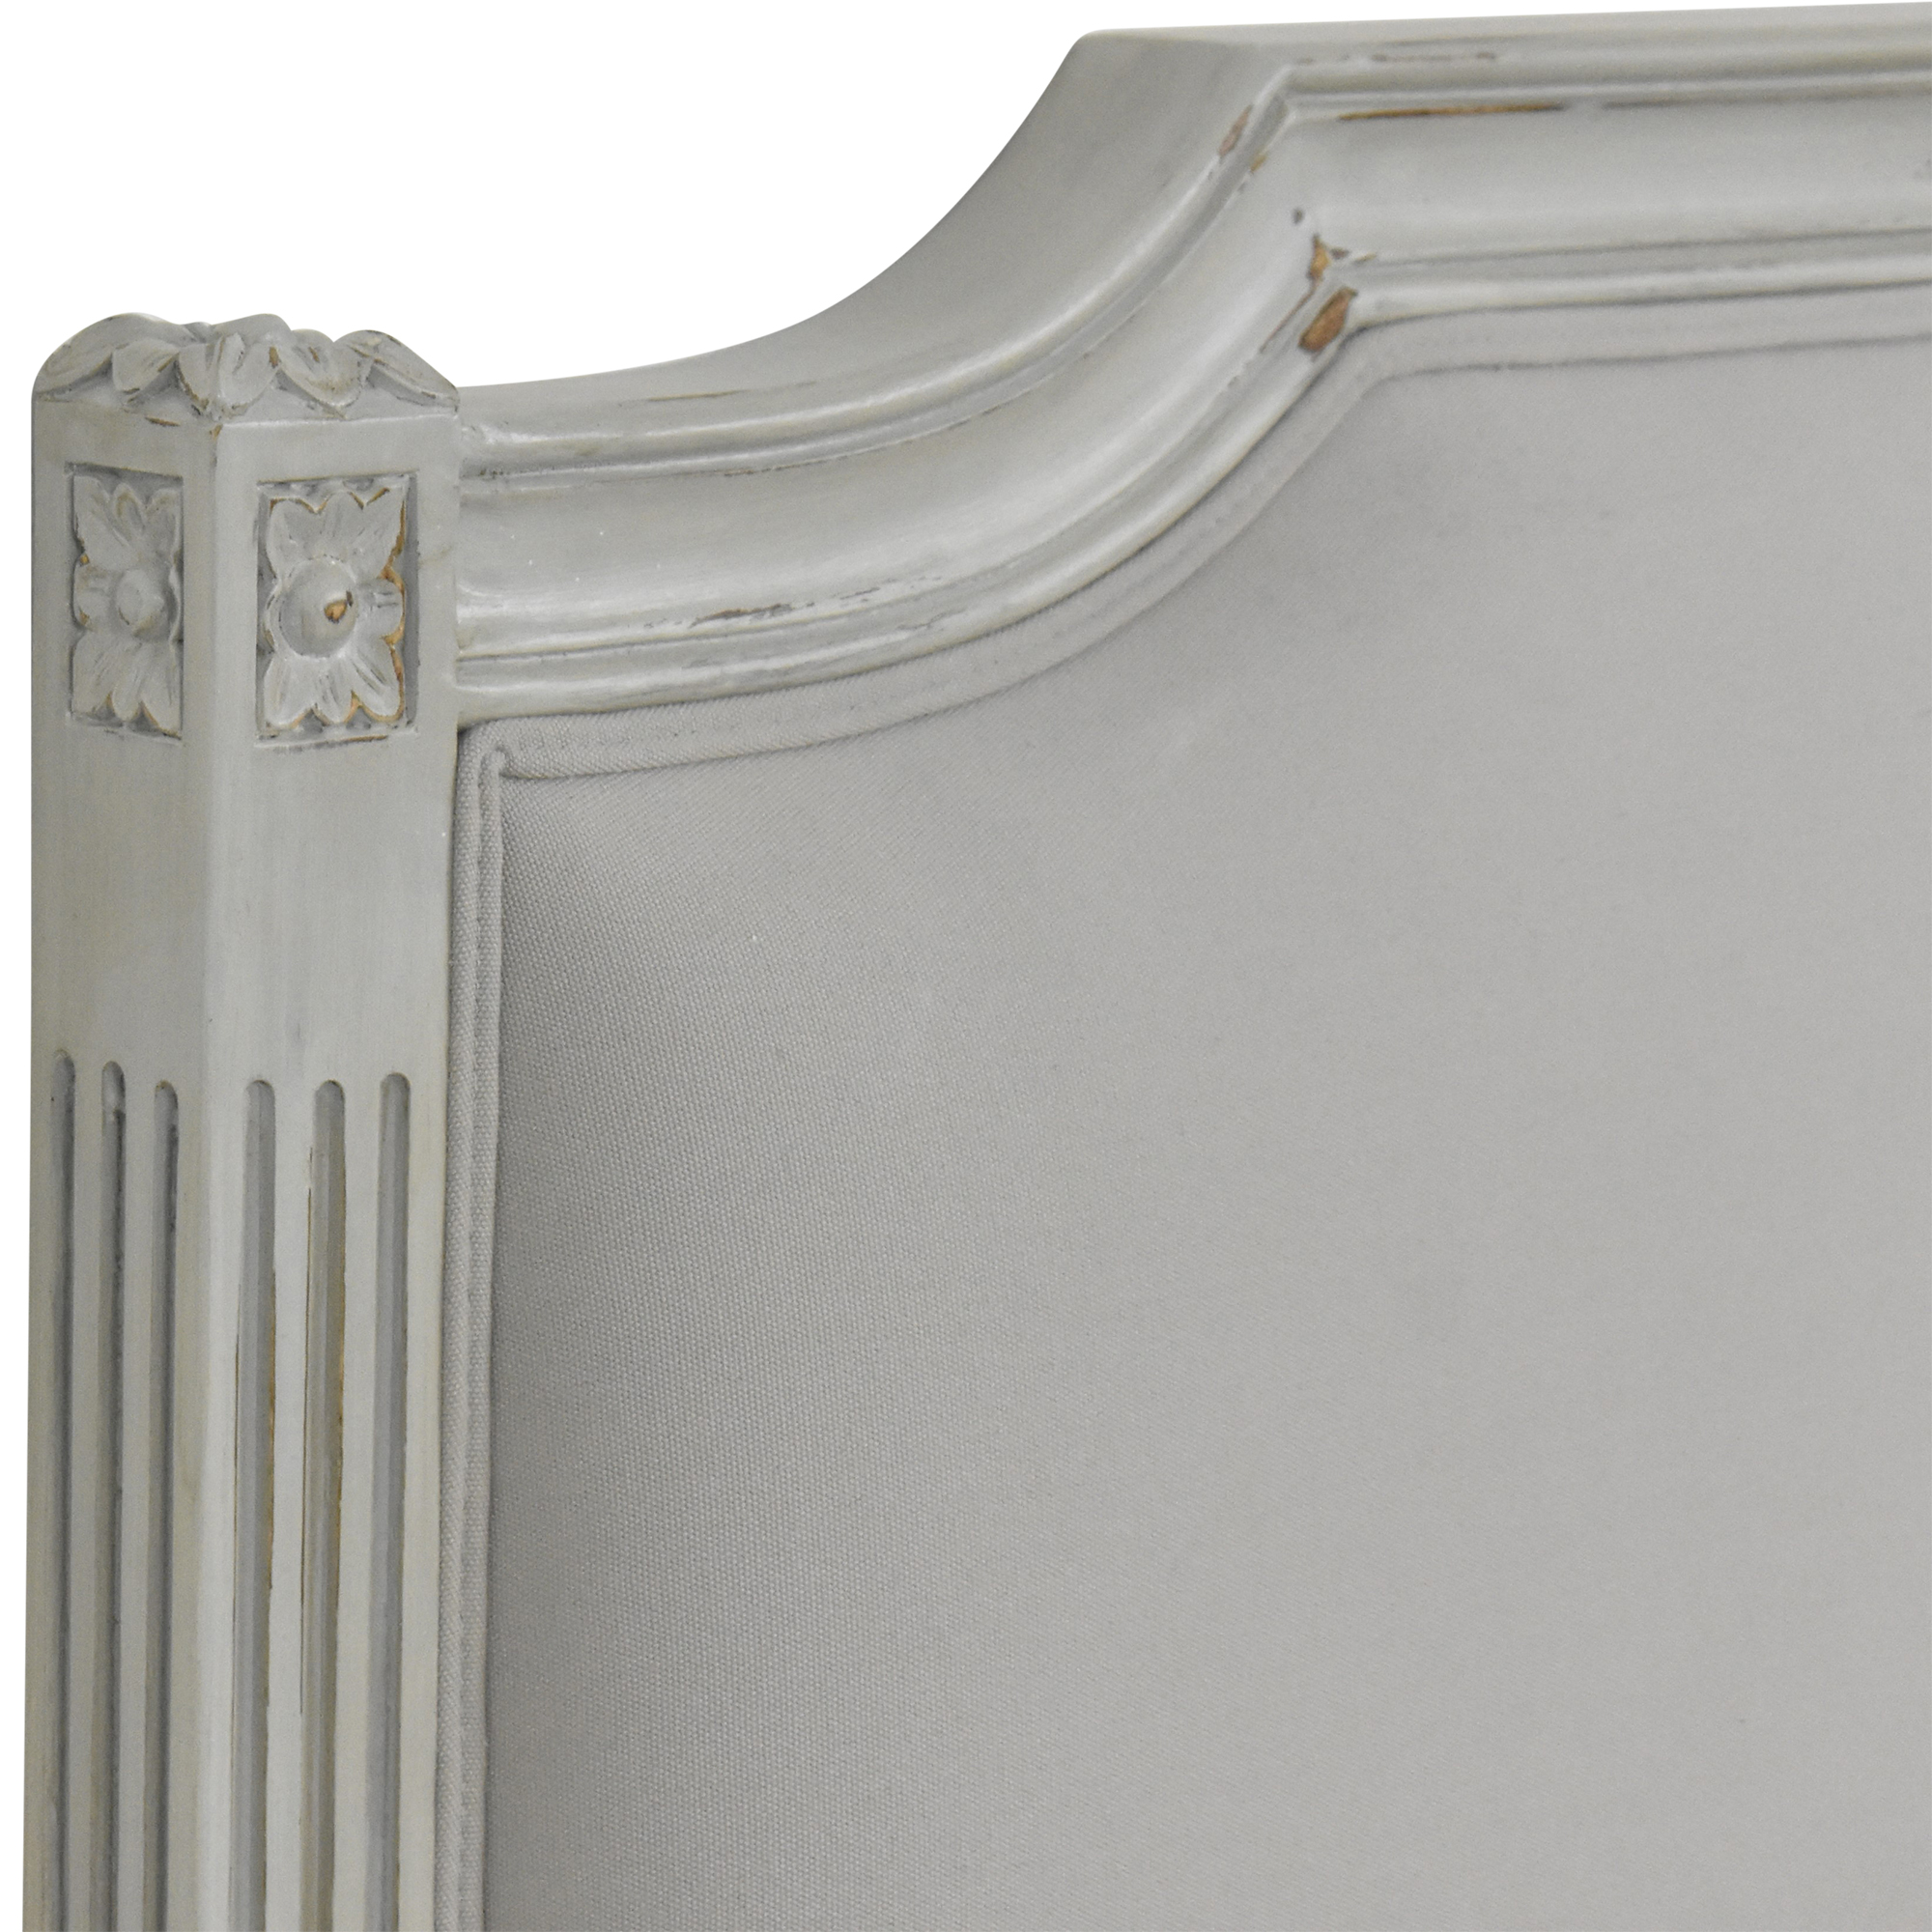 buy Wayfair One Allium Way Le Reve Upholstered Panel King Headboard Wayfair